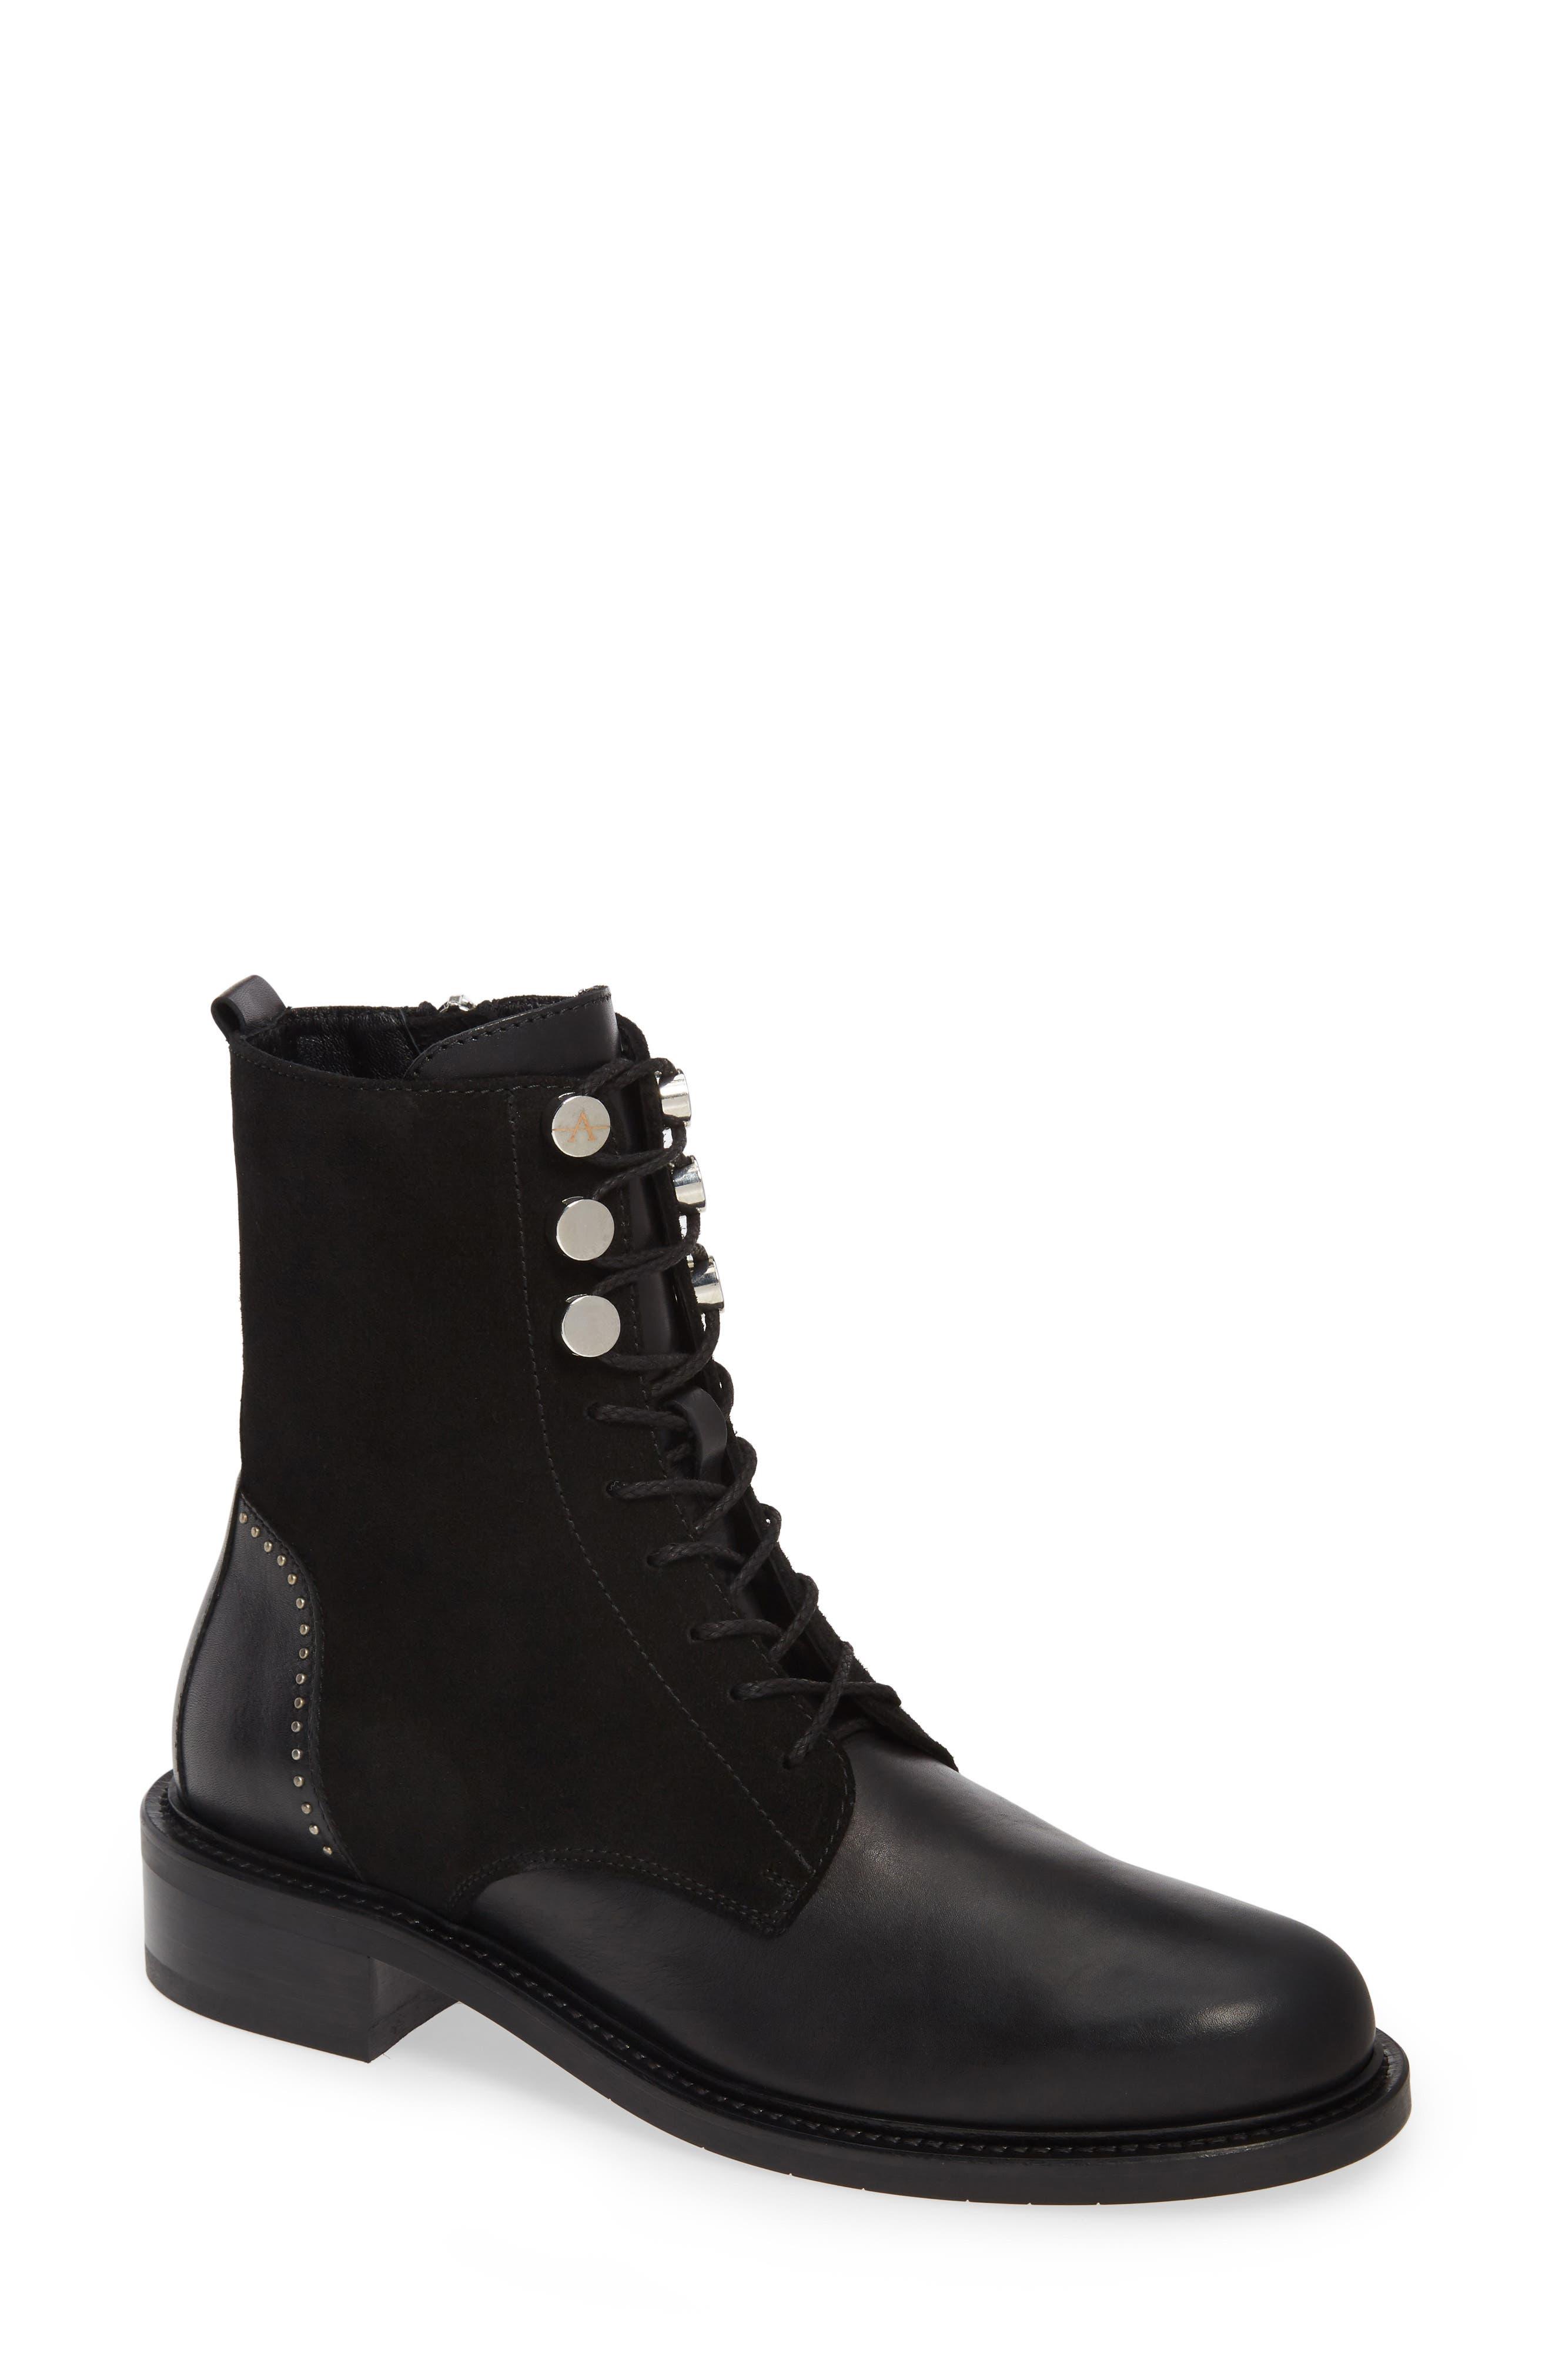 Aquatalia Ali Weatherproof Boot- Black